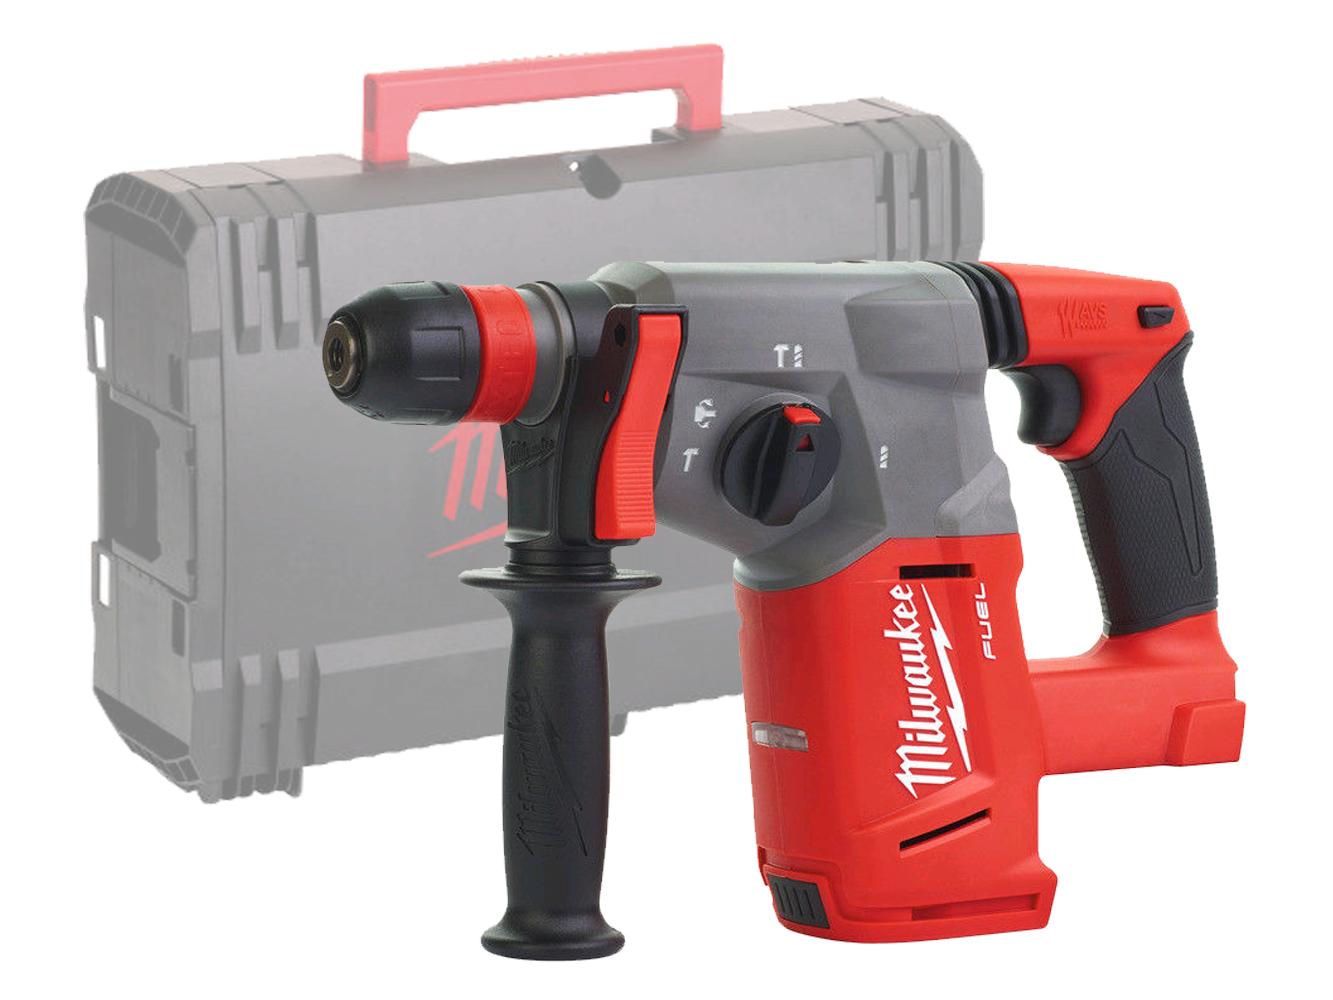 Milwaukee M18CHX 18V Fuel Brushless SDS+ 3-Mode Hammer Drill- Body Only